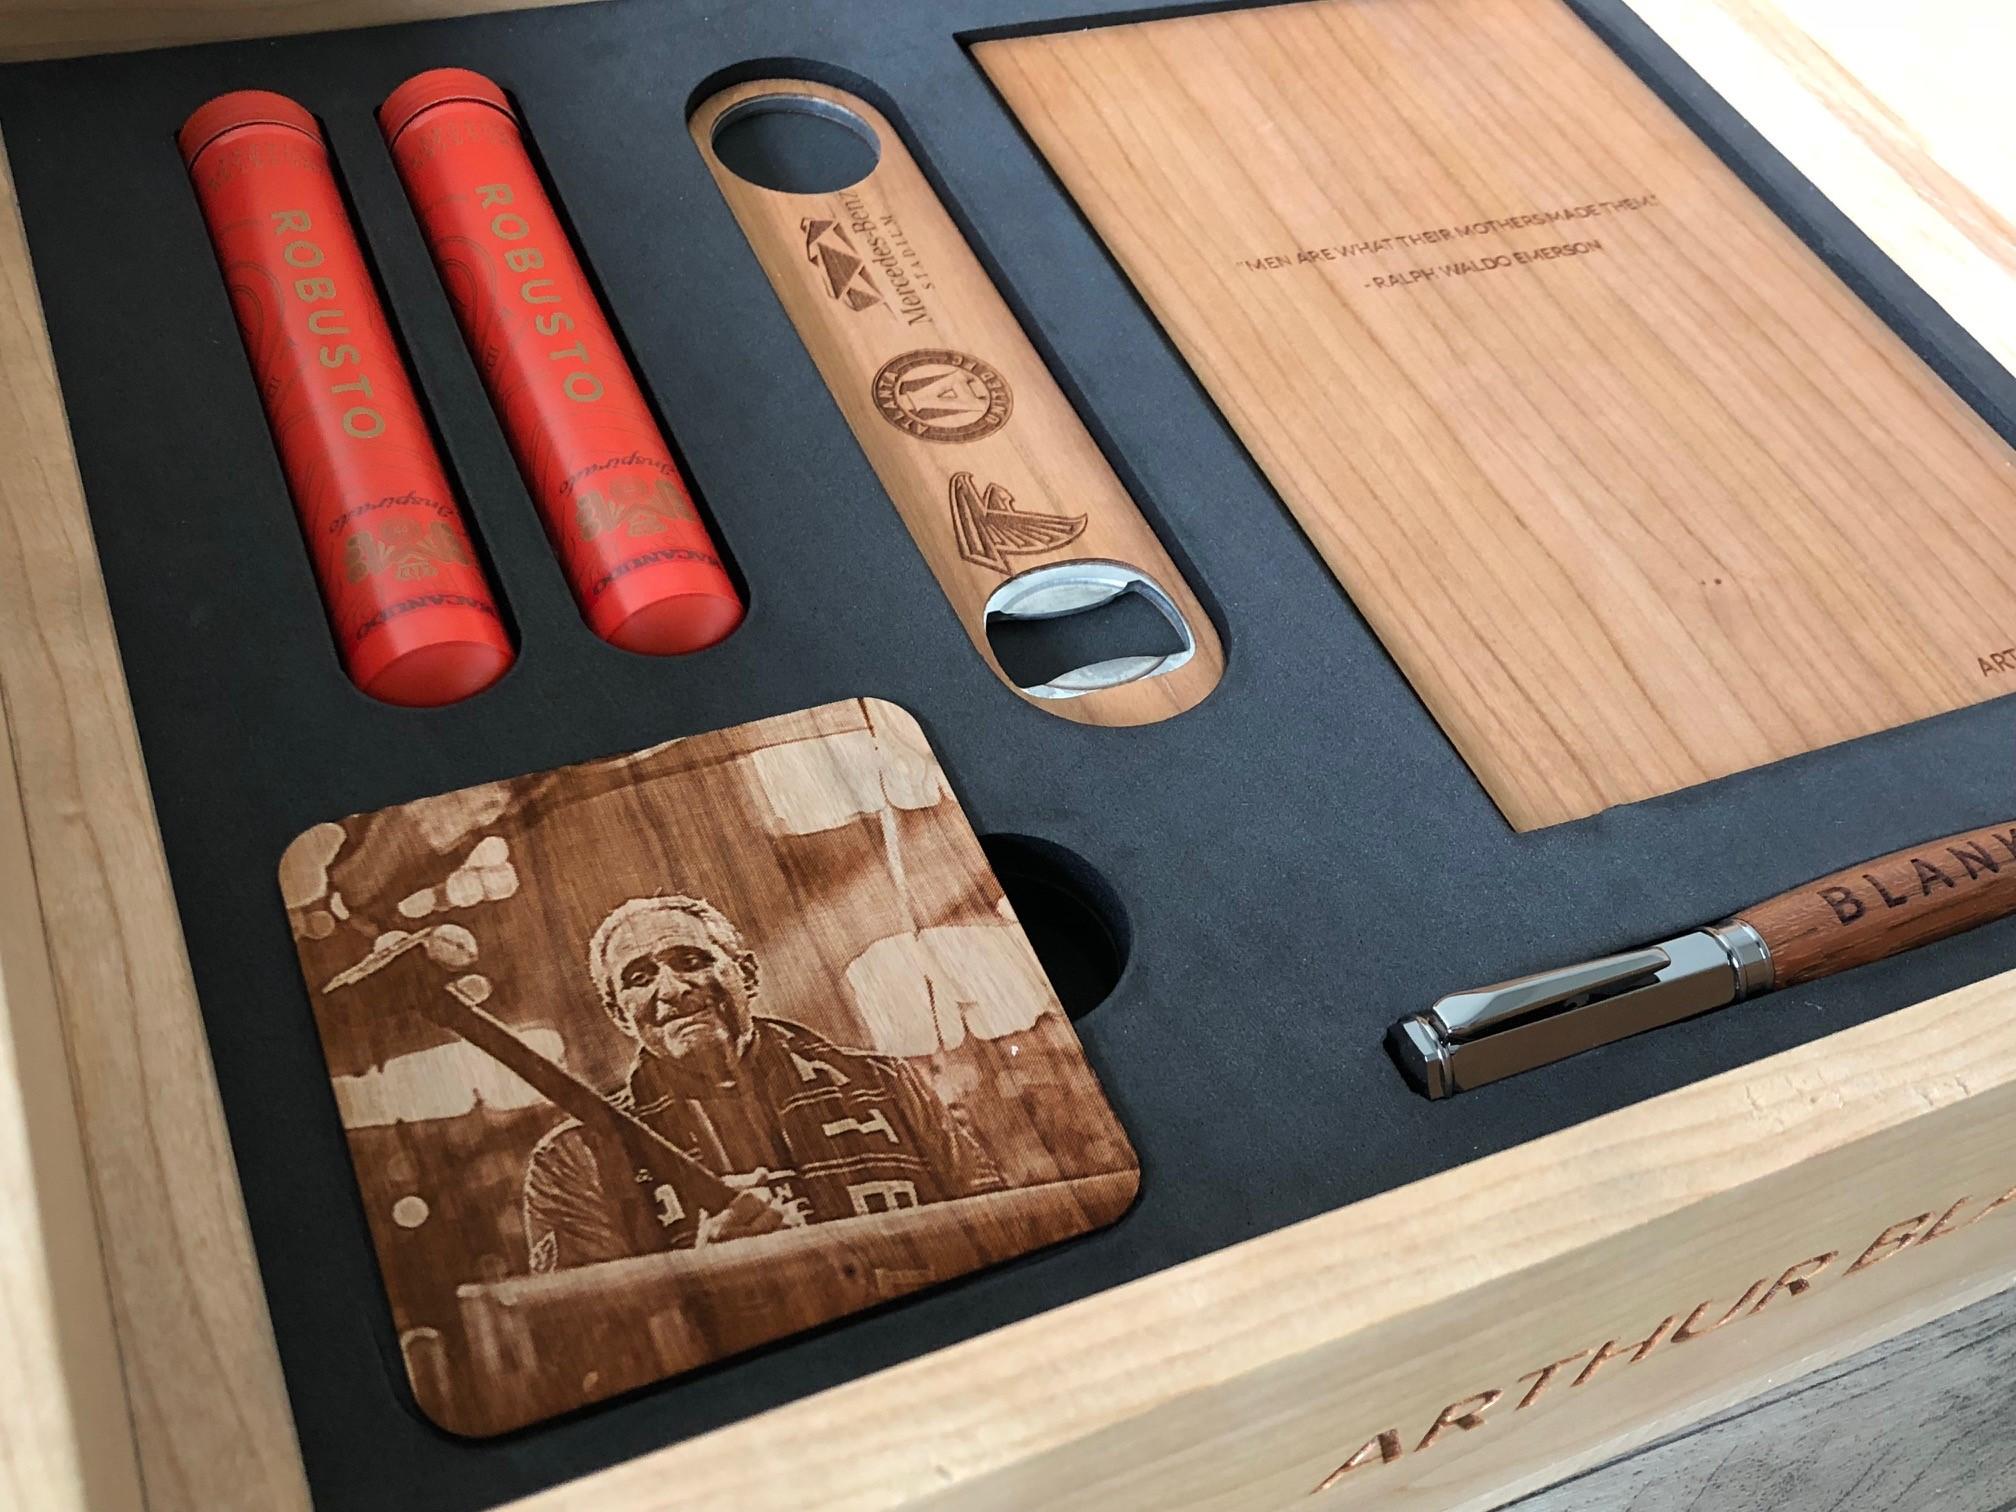 Cigars, Pen, Journal, Coasters & Bottle Opener Box